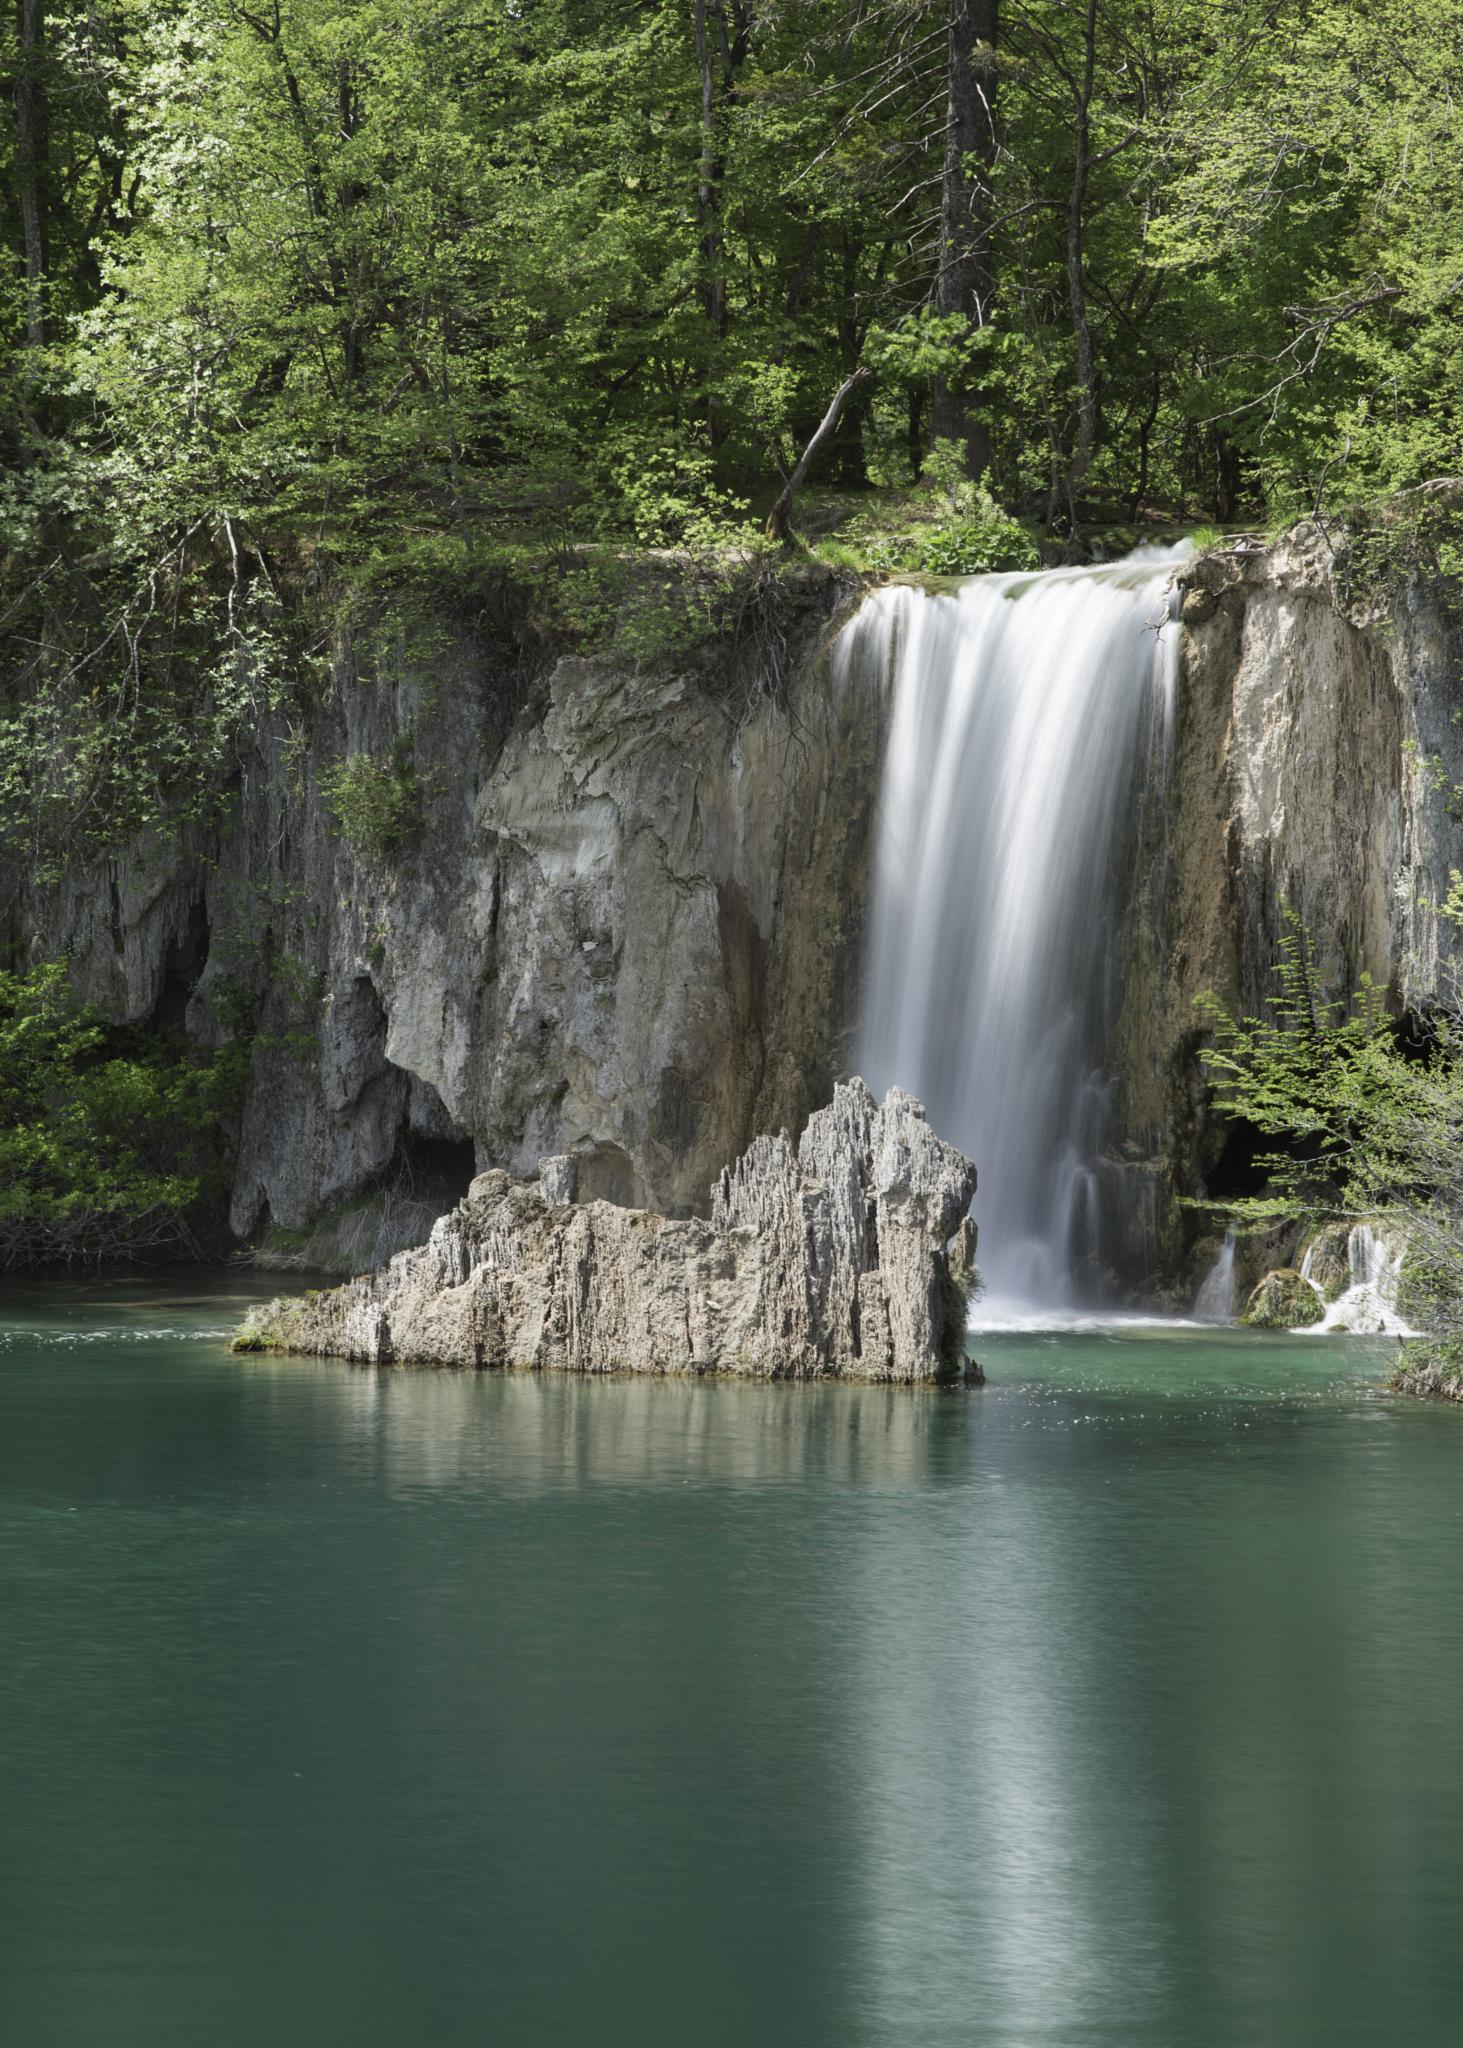 Azure Waterfall by hayleyholloway1969